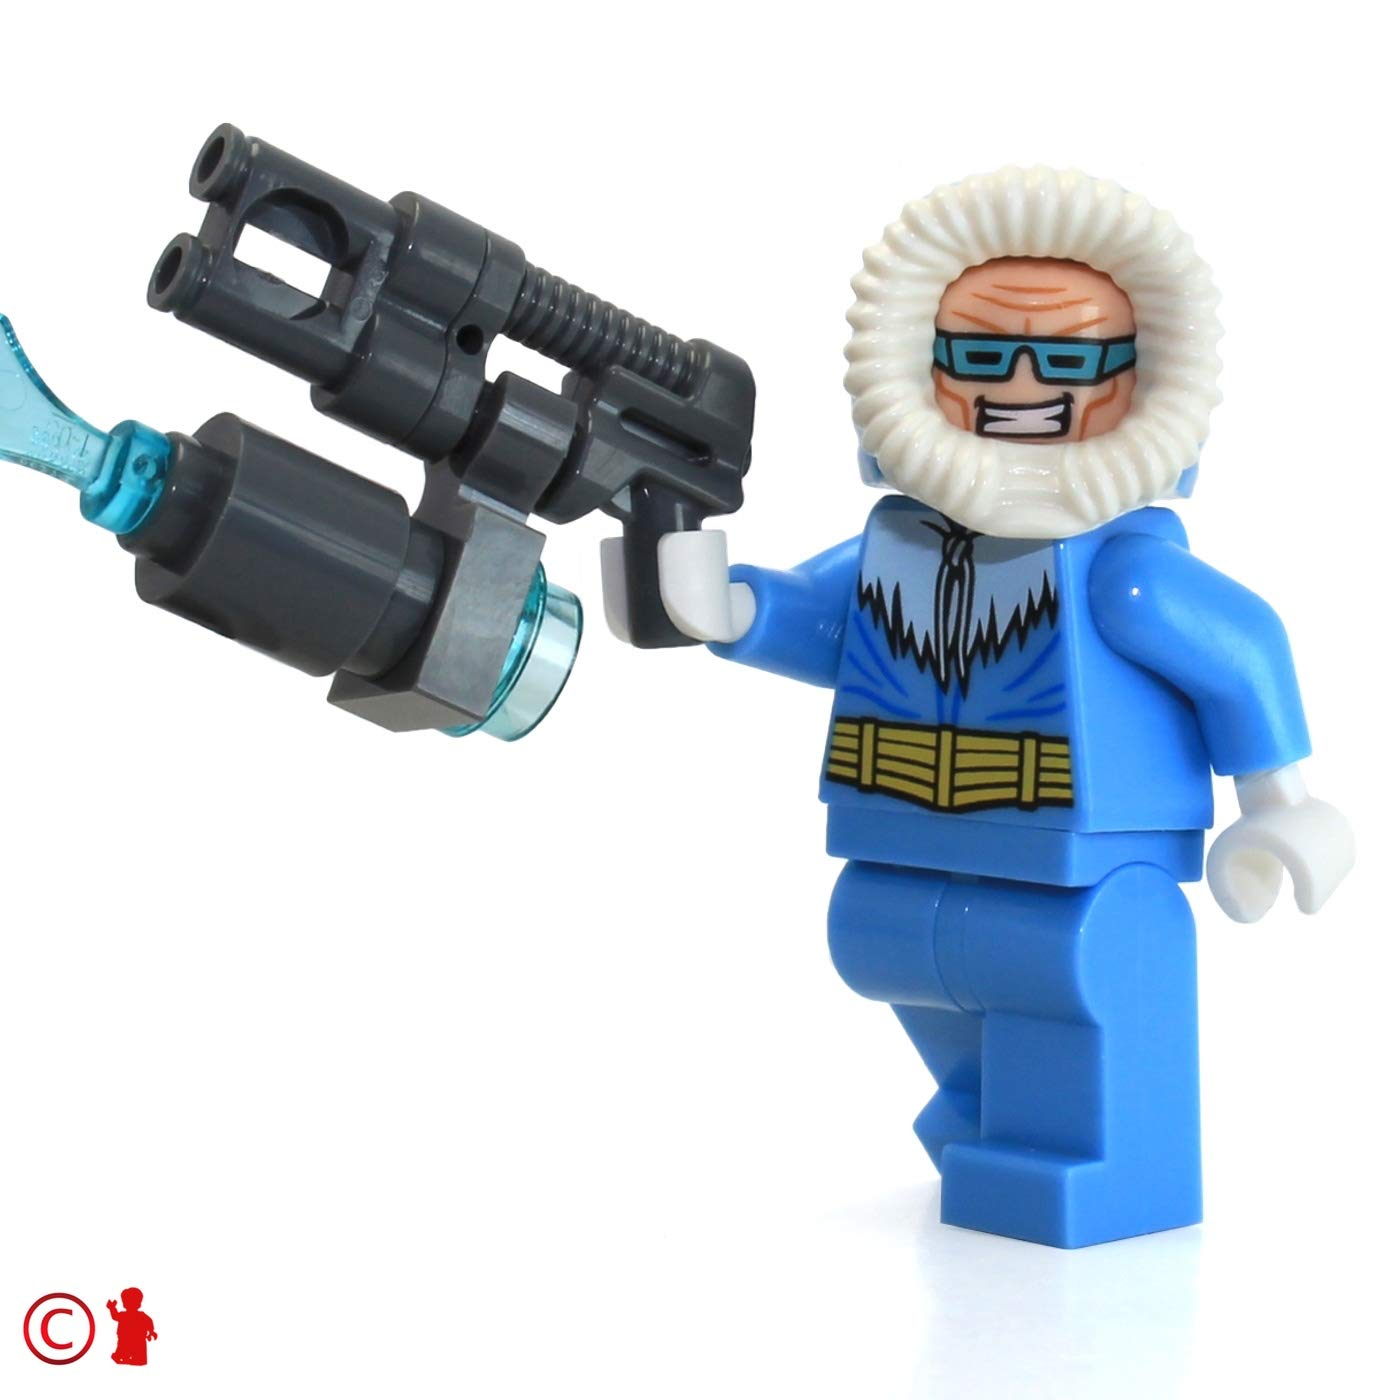 Captain Cold LEGO DC Super Heroes Justice League MiniFigure 76026 with Freeze Gun